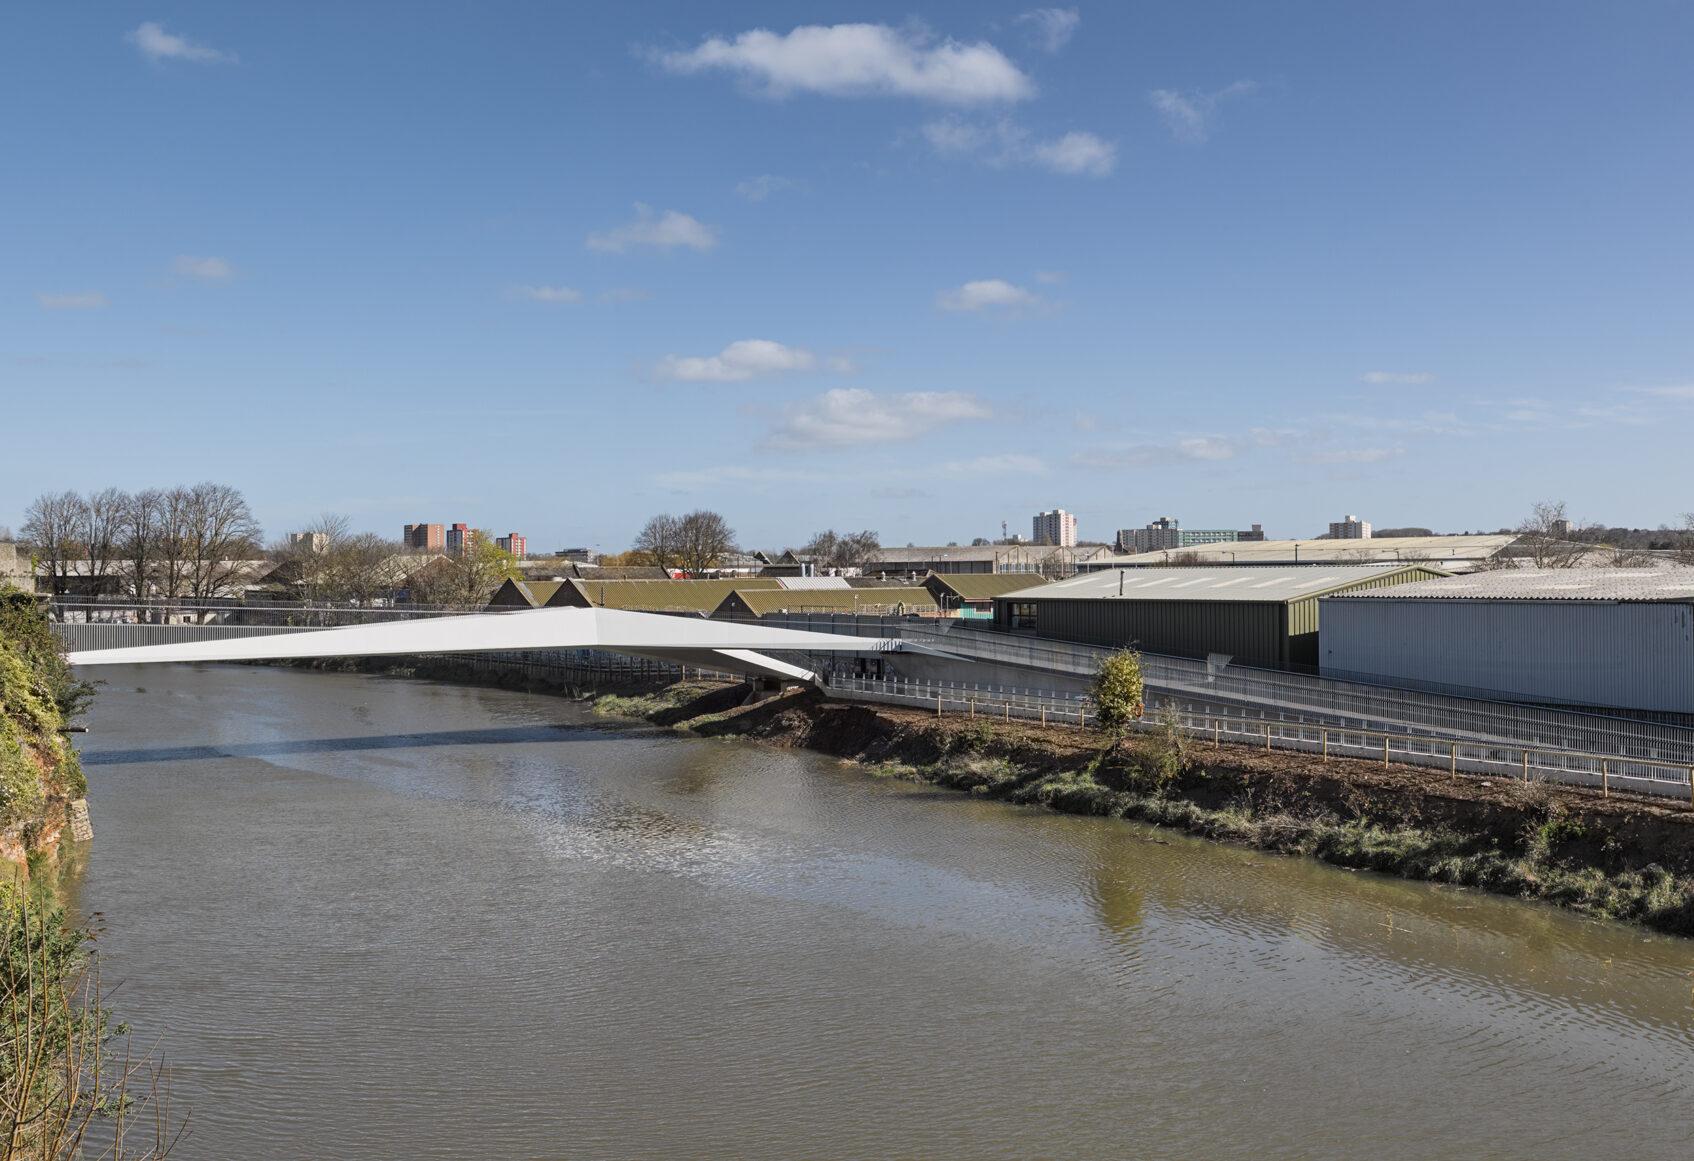 Footbridge in distance crossing River Avon in Bristol